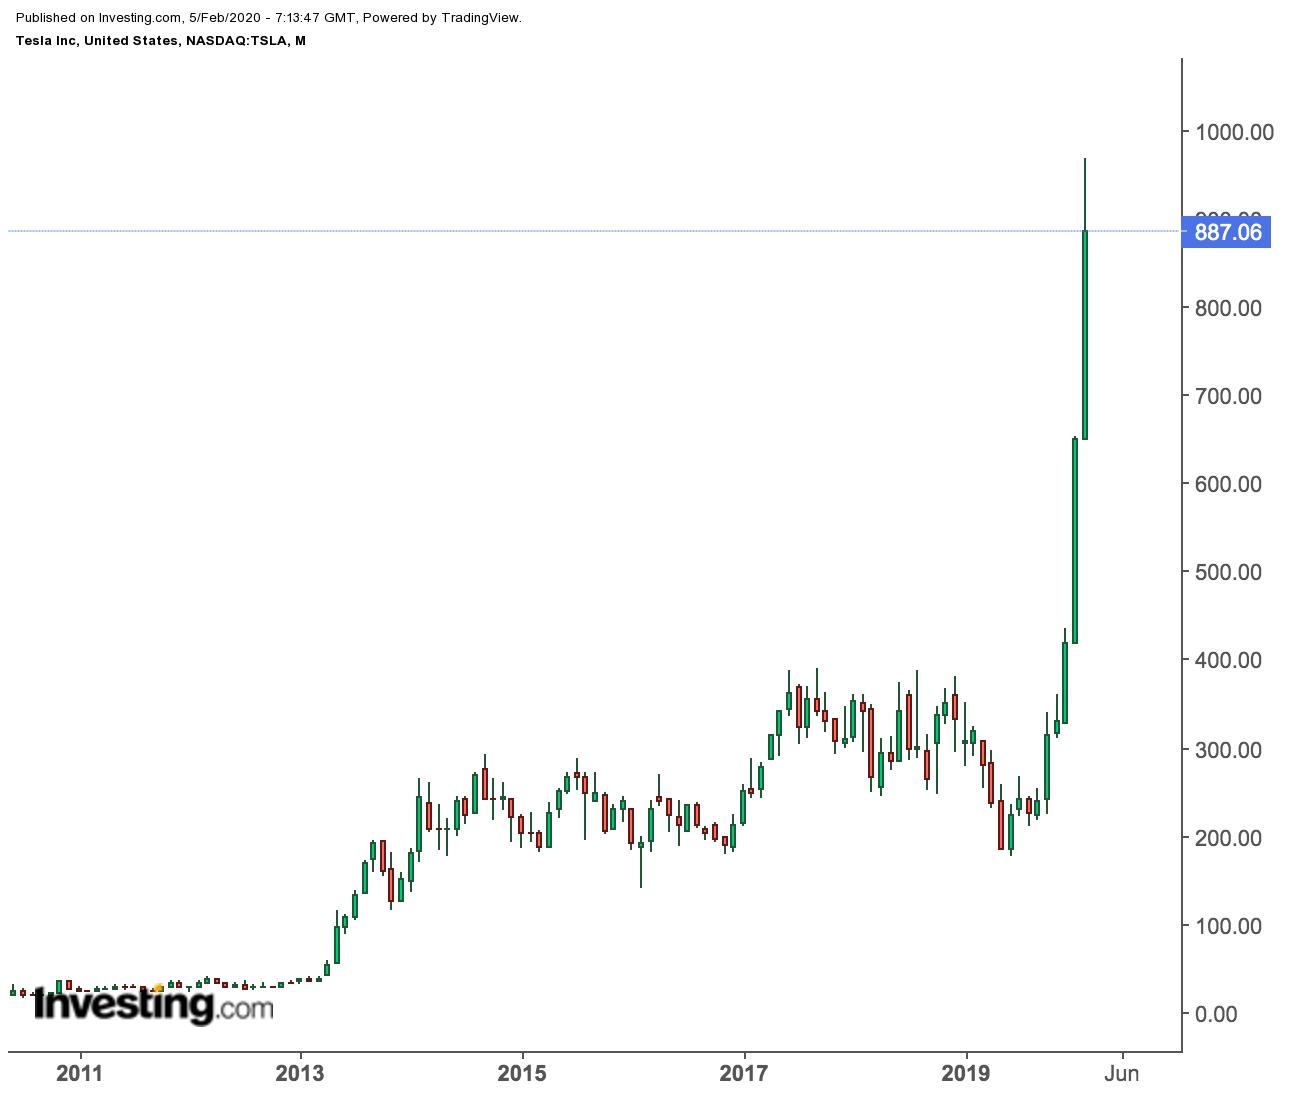 Is It Too Late To Buy Tesla Stock